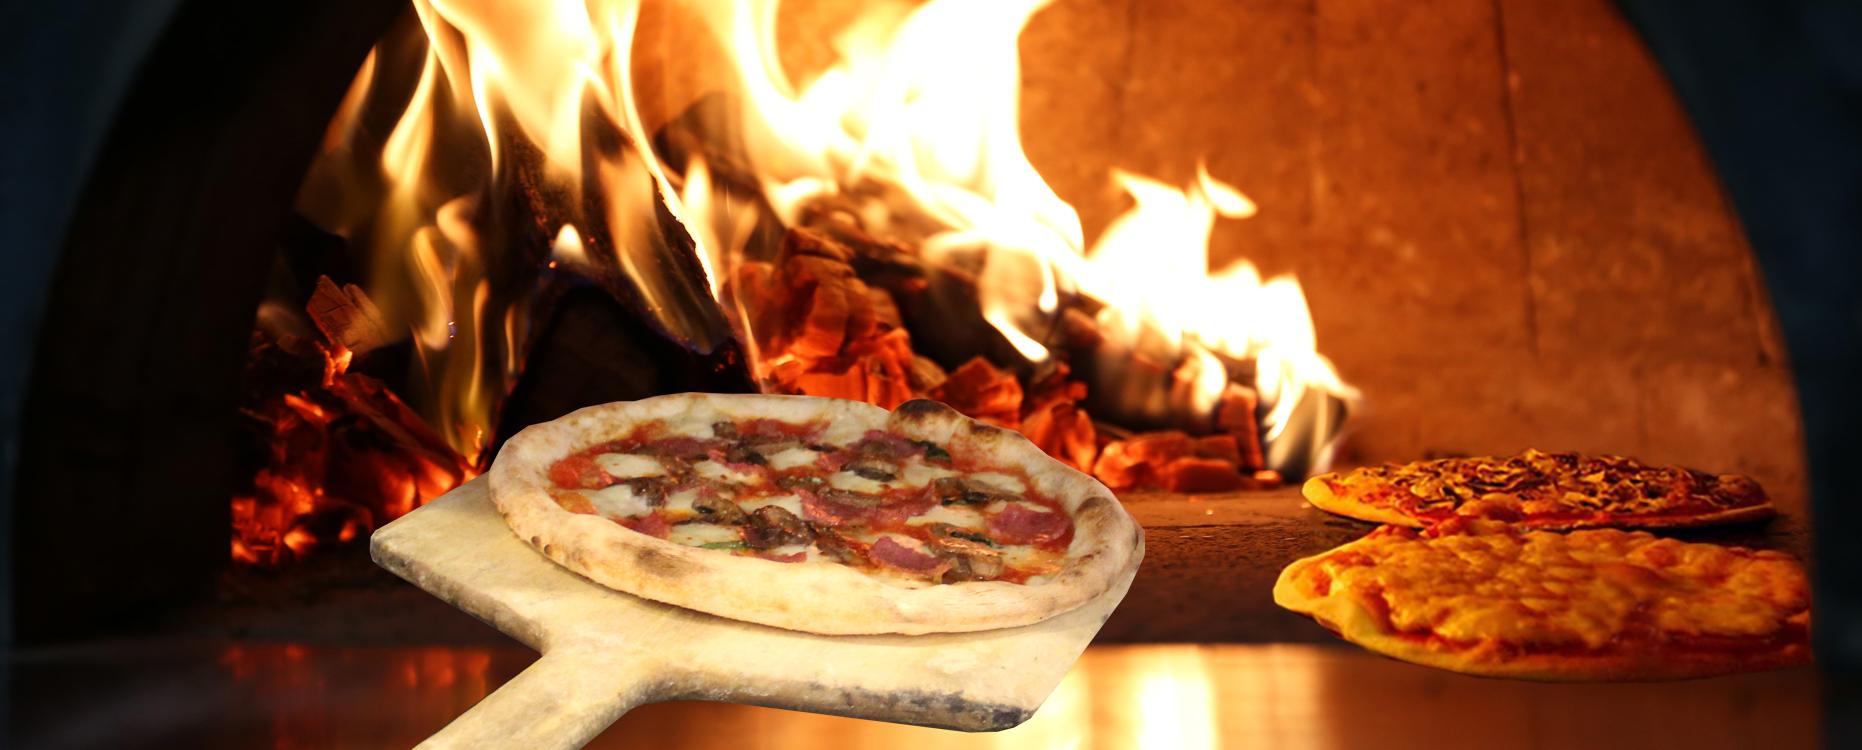 Duca S Neopolitan Pizza Home